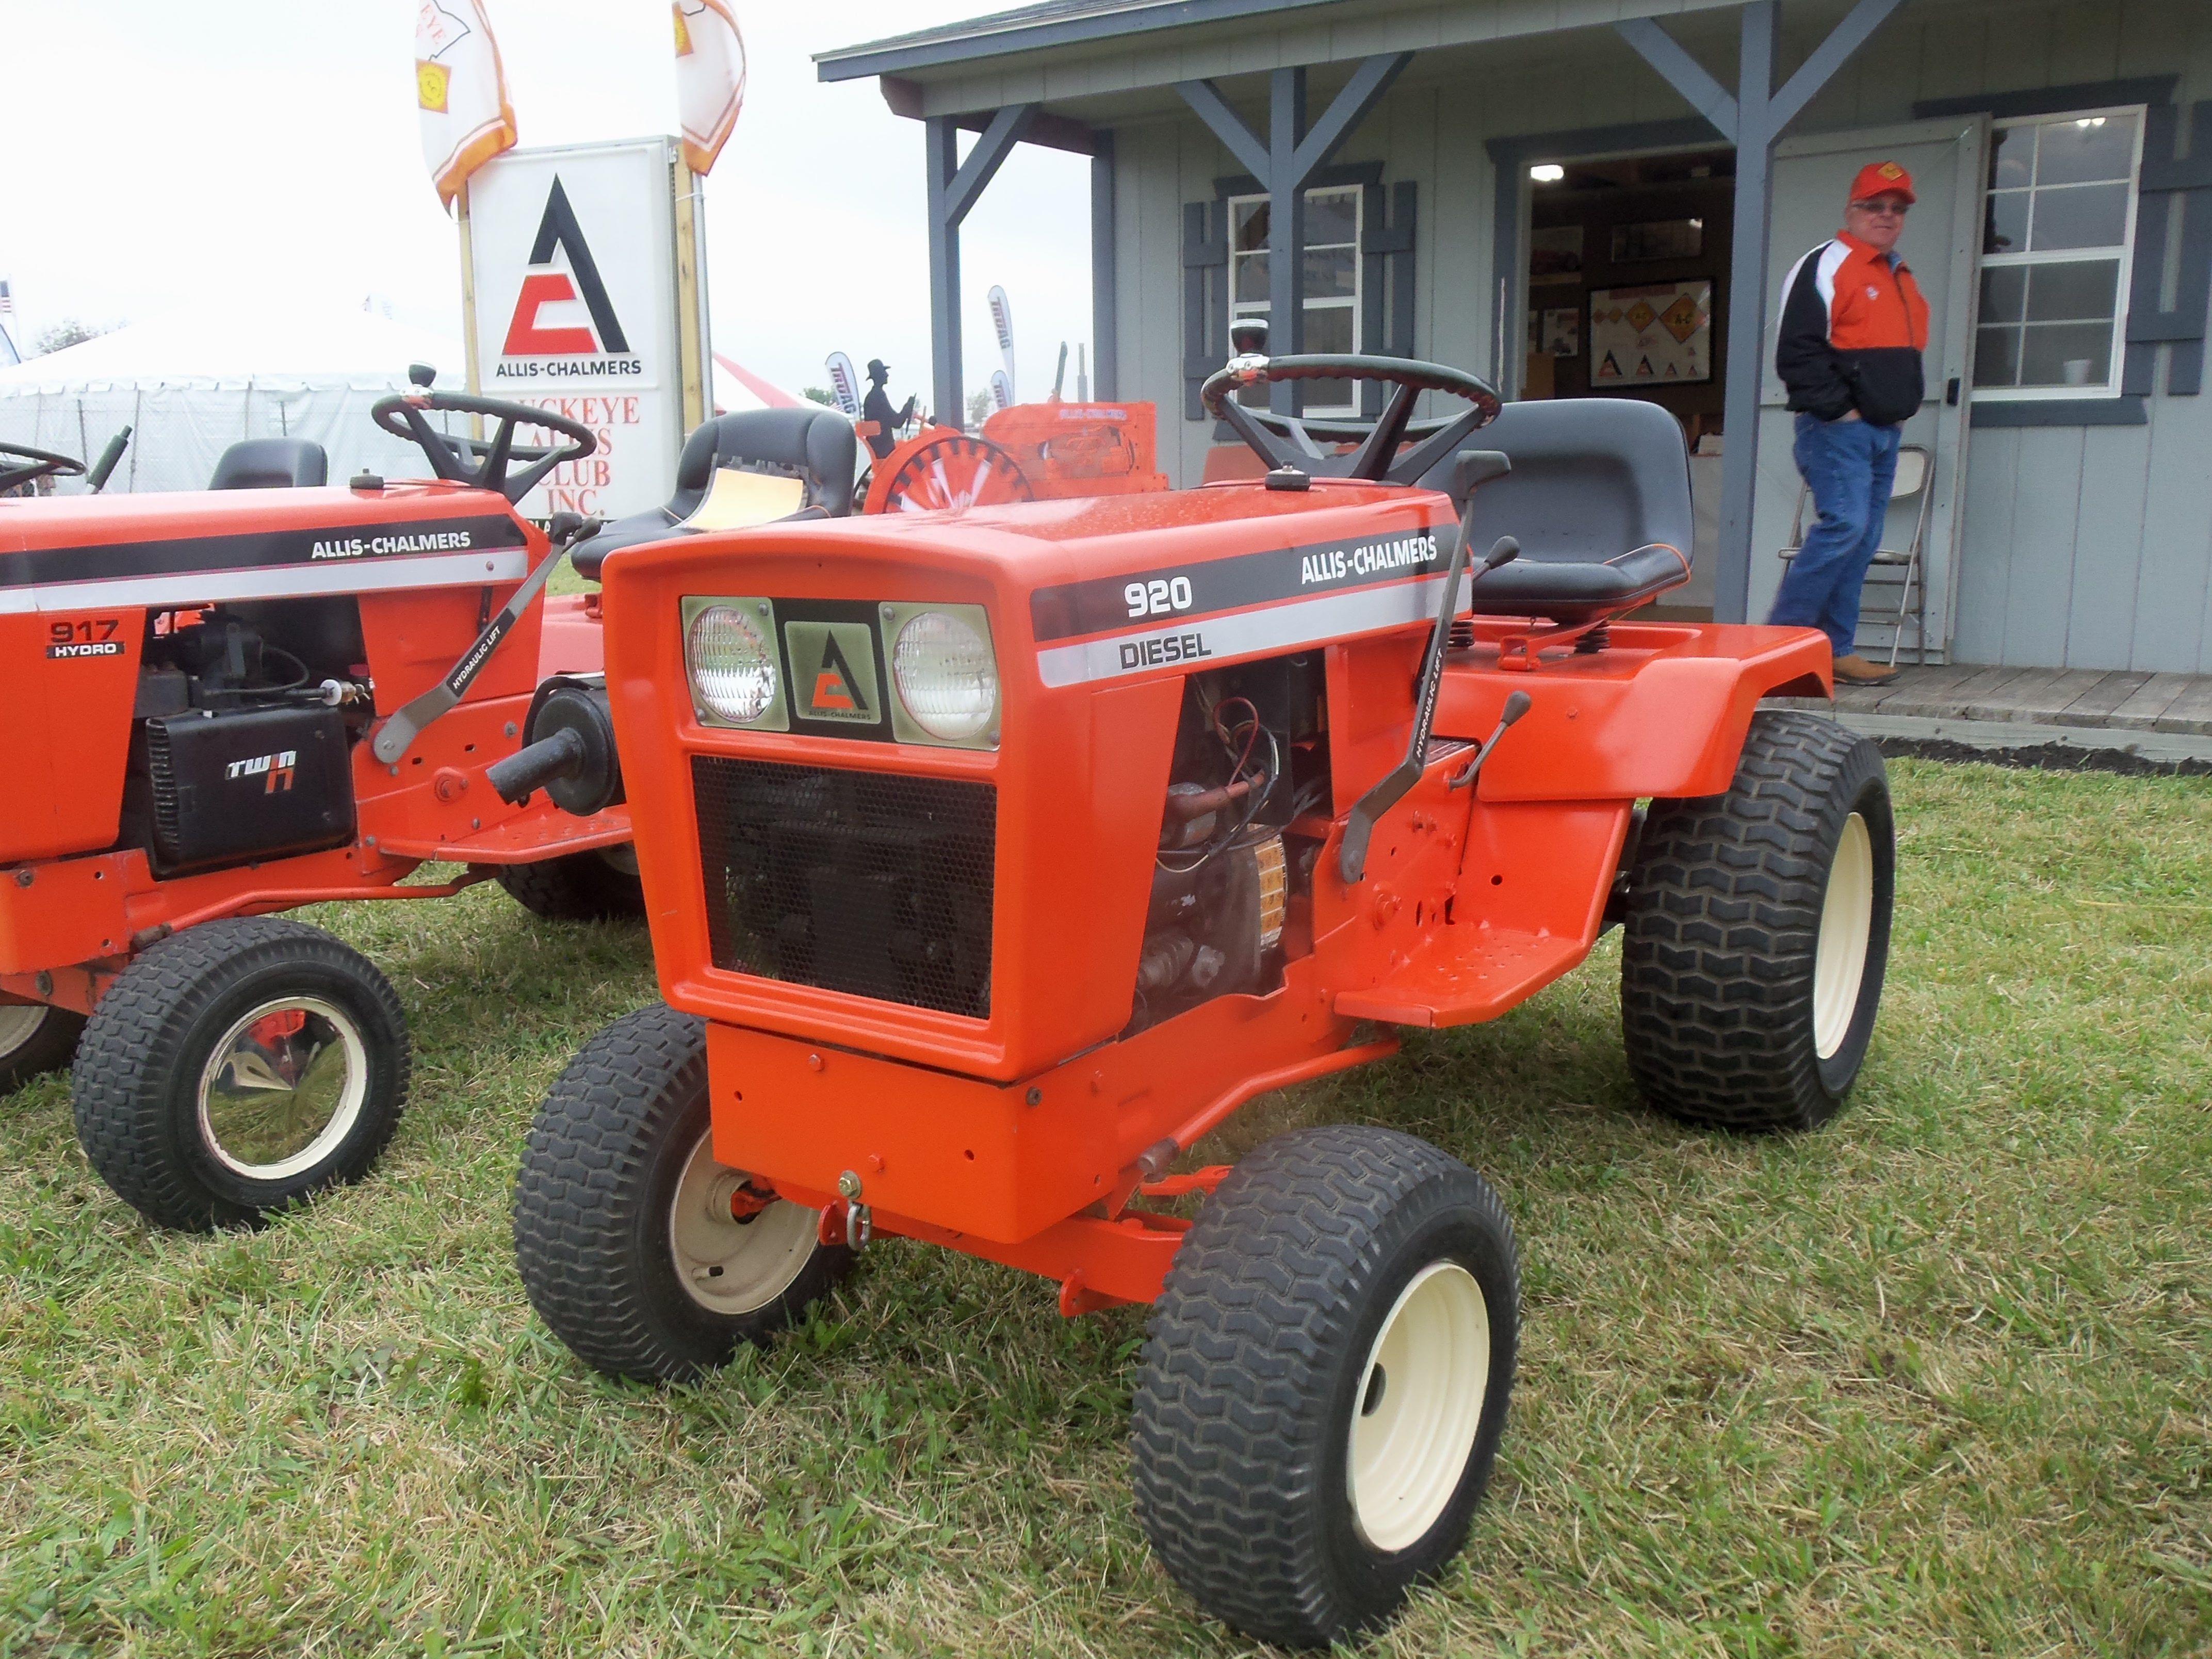 Allis Chalmers 920 Lawn U0026 Garden Tractor.